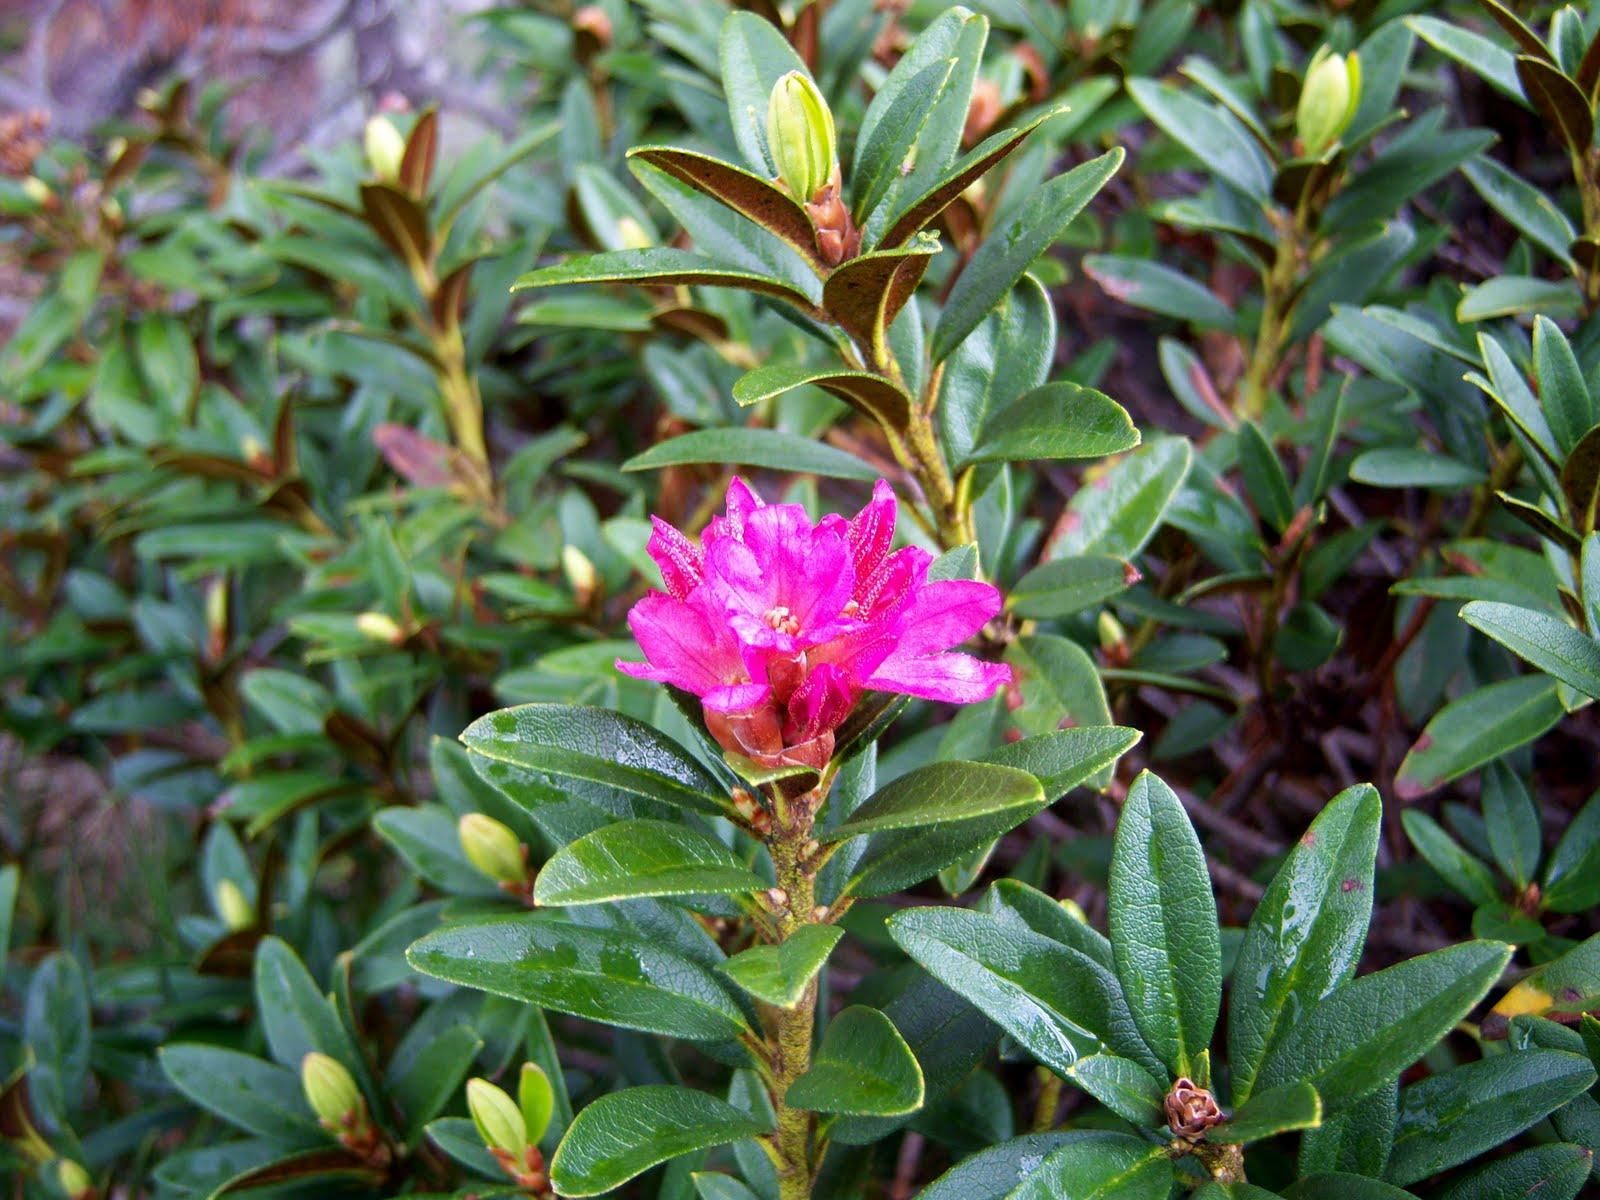 Rododendro bot nic serrat - Rododendro arbol ...